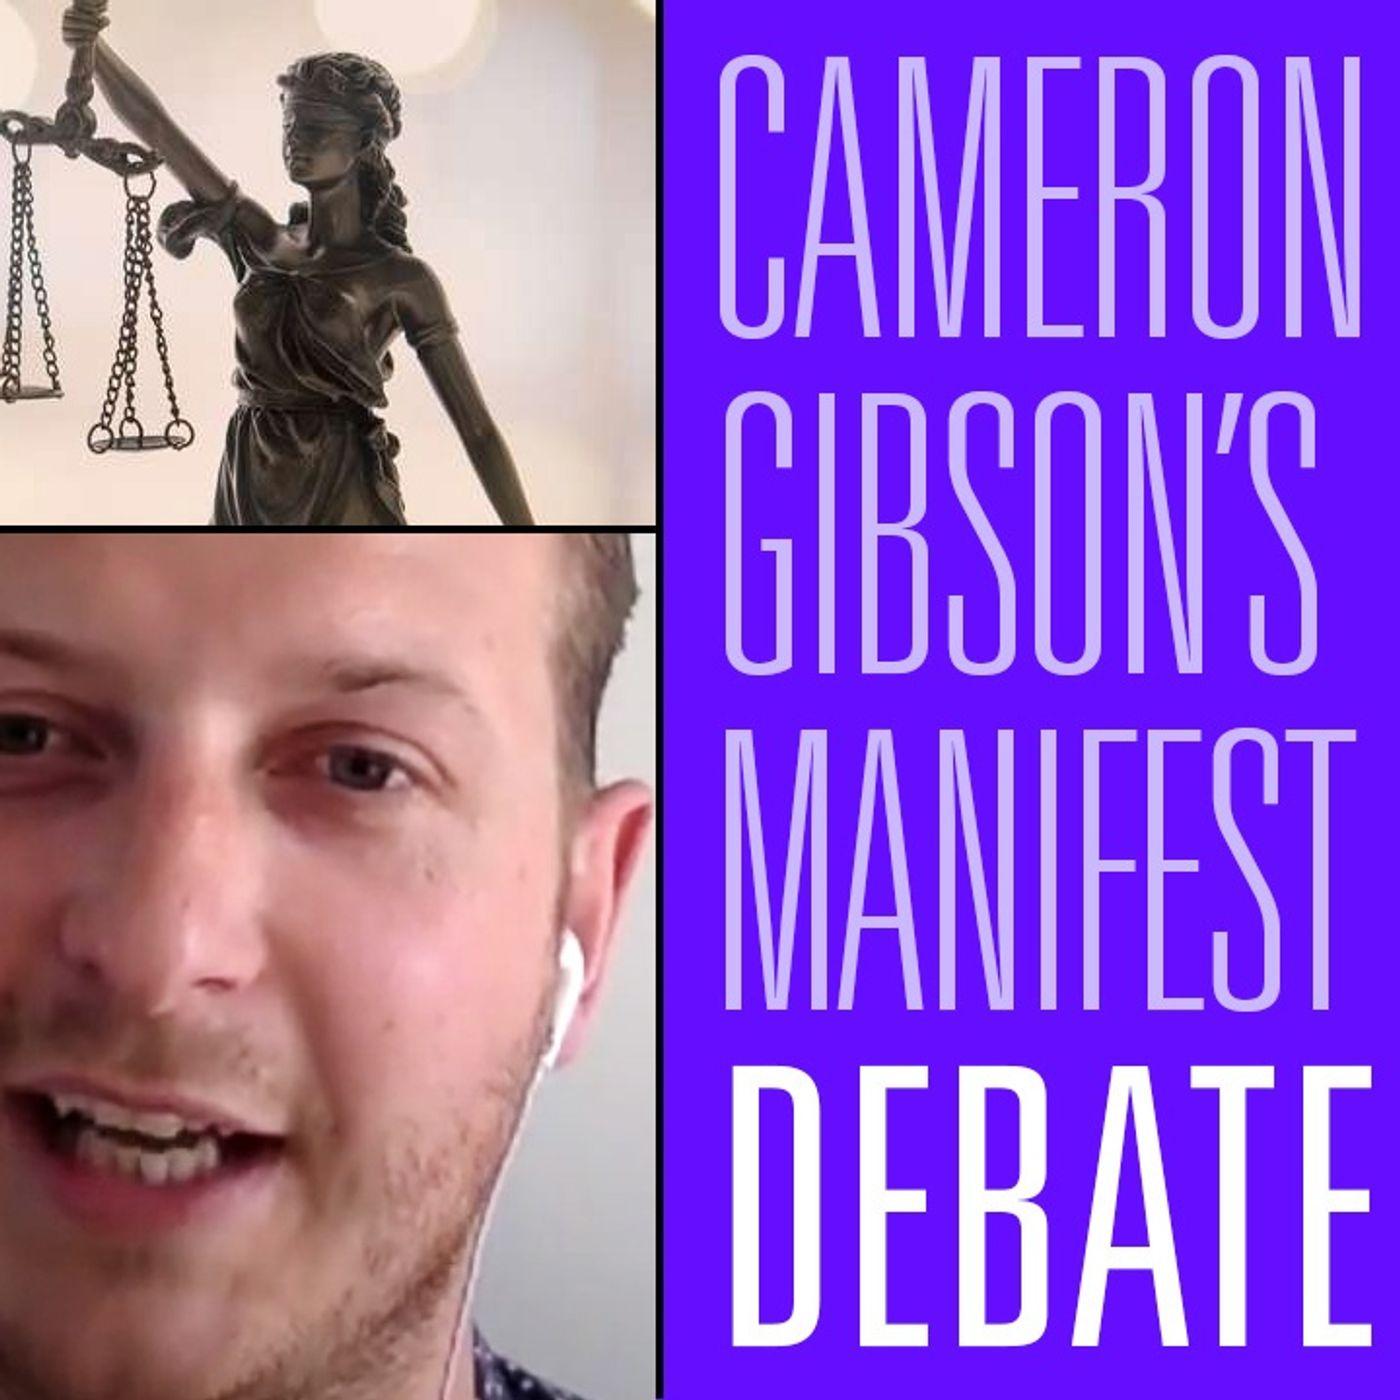 A Critique of Cameron Gibson's Manifest   HBR Debate 59